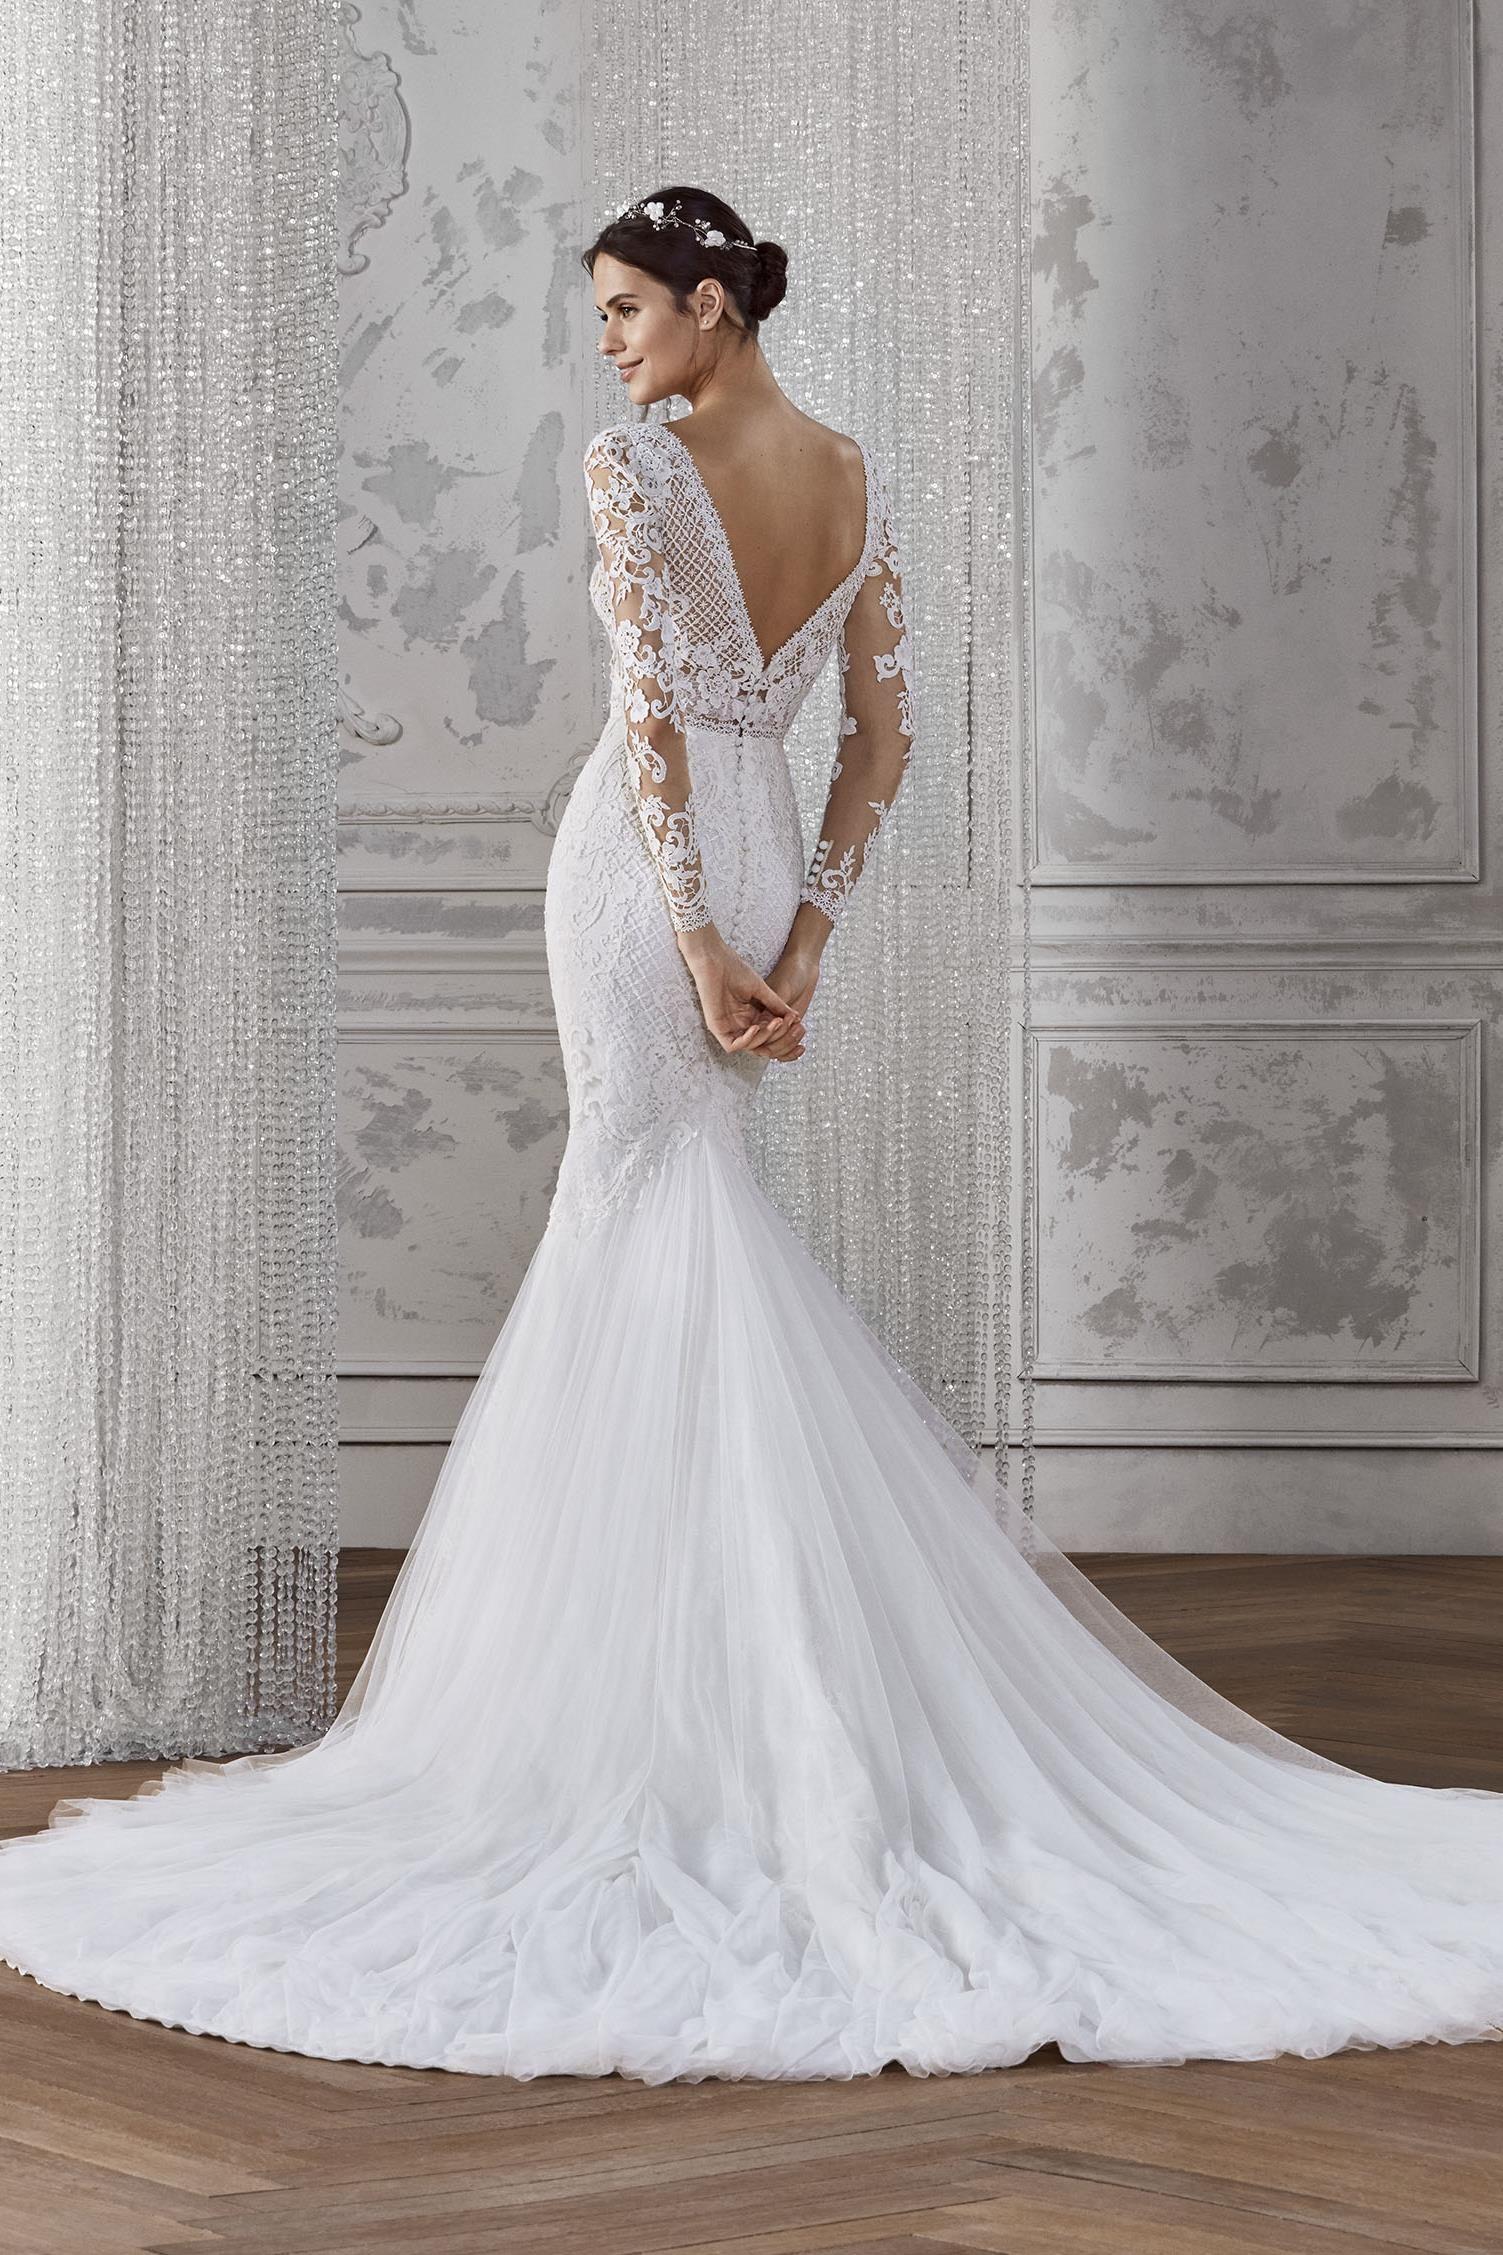 Kadie Wedding Dress From St Patrick Studio Hitched Co Uk Slim Fit Wedding Dresses Long Sleeve Mermaid Wedding Dress Stunning Wedding Dresses [ 2255 x 1503 Pixel ]